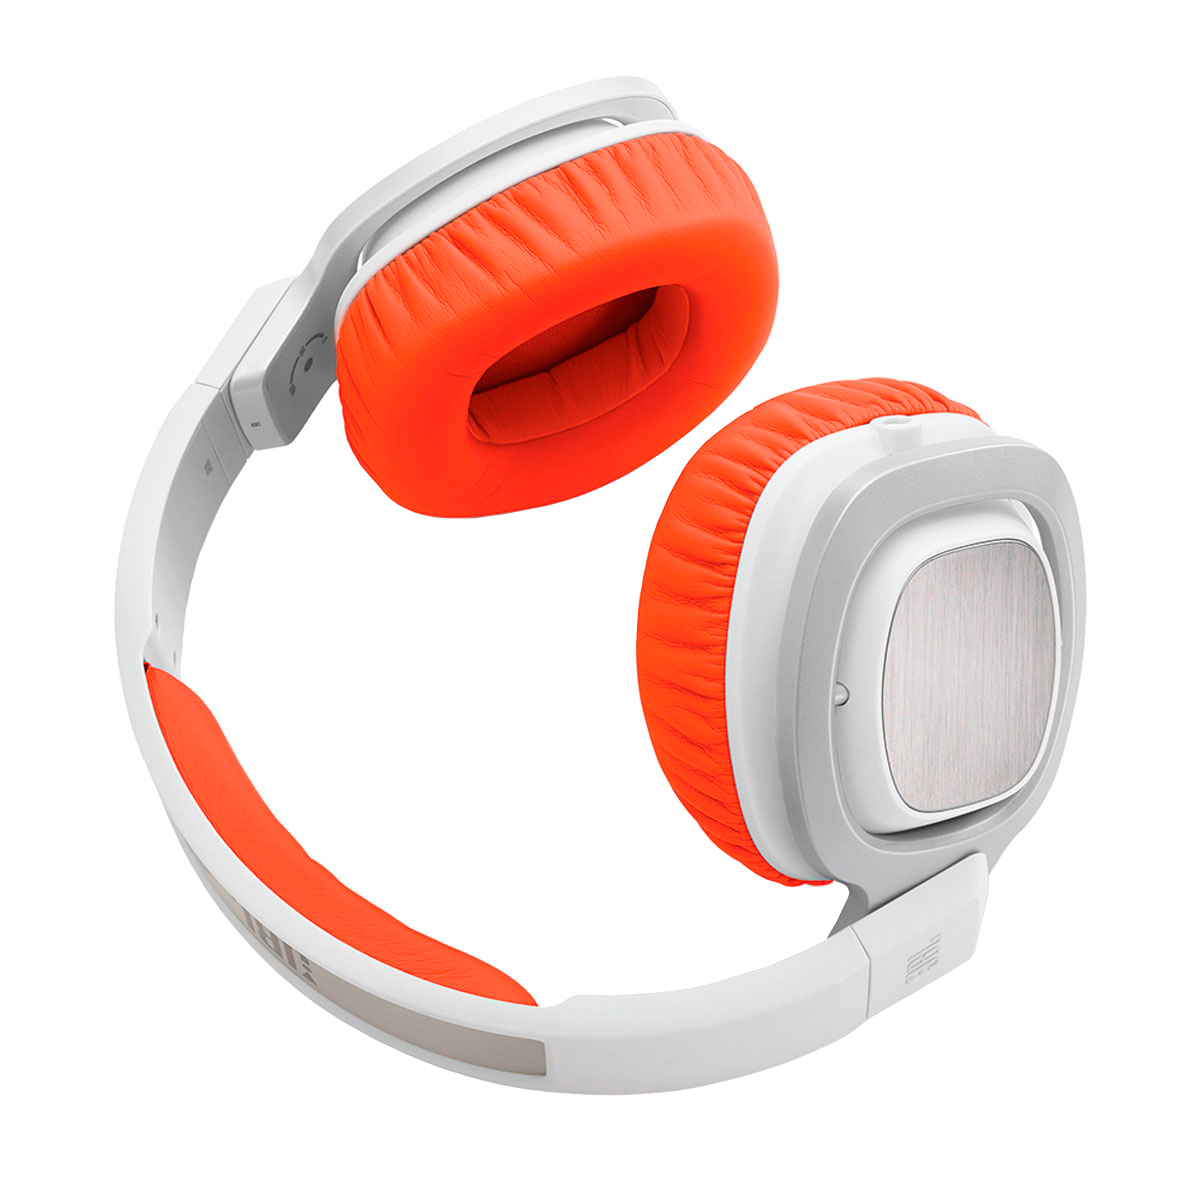 Fone de Ouvido Over-Ear c/ Microfone p/ iPhone / iPad / iPod J 88i - JBL